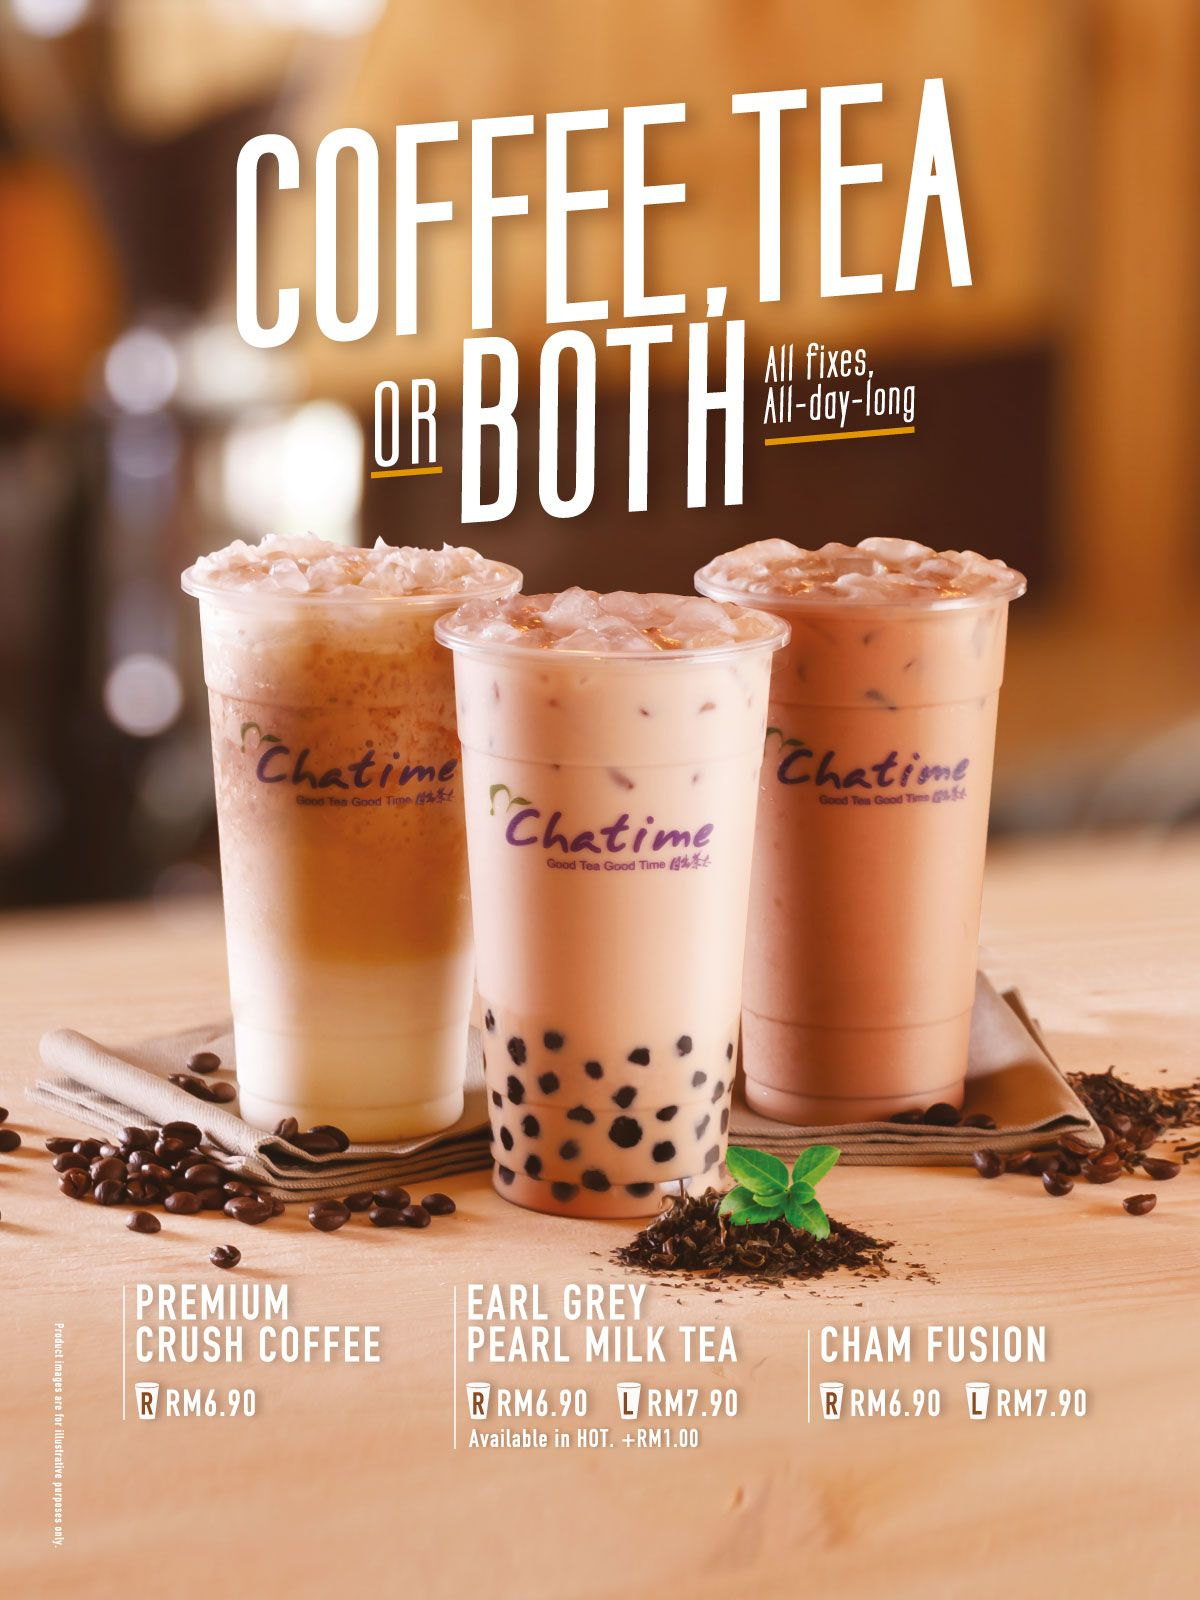 Chatime herbal tea - Chatime Malaysia Coffee Tea Or Both New Series Varietea